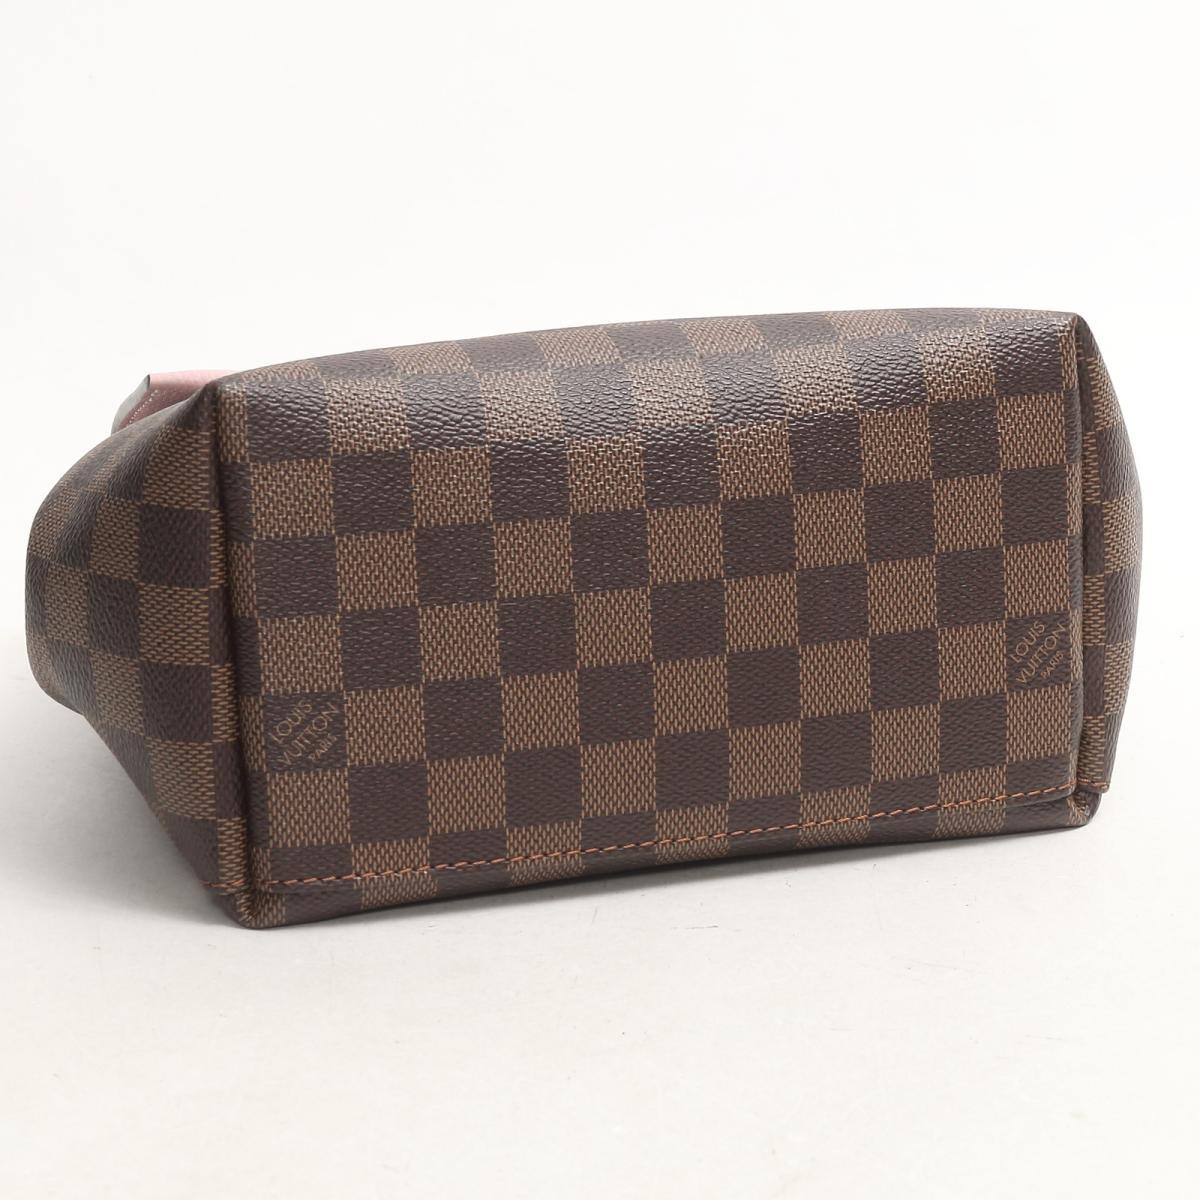 LOUIS VUITTON バッグ N42262 【おすすめ!】クラプトン バックパック リュックサック